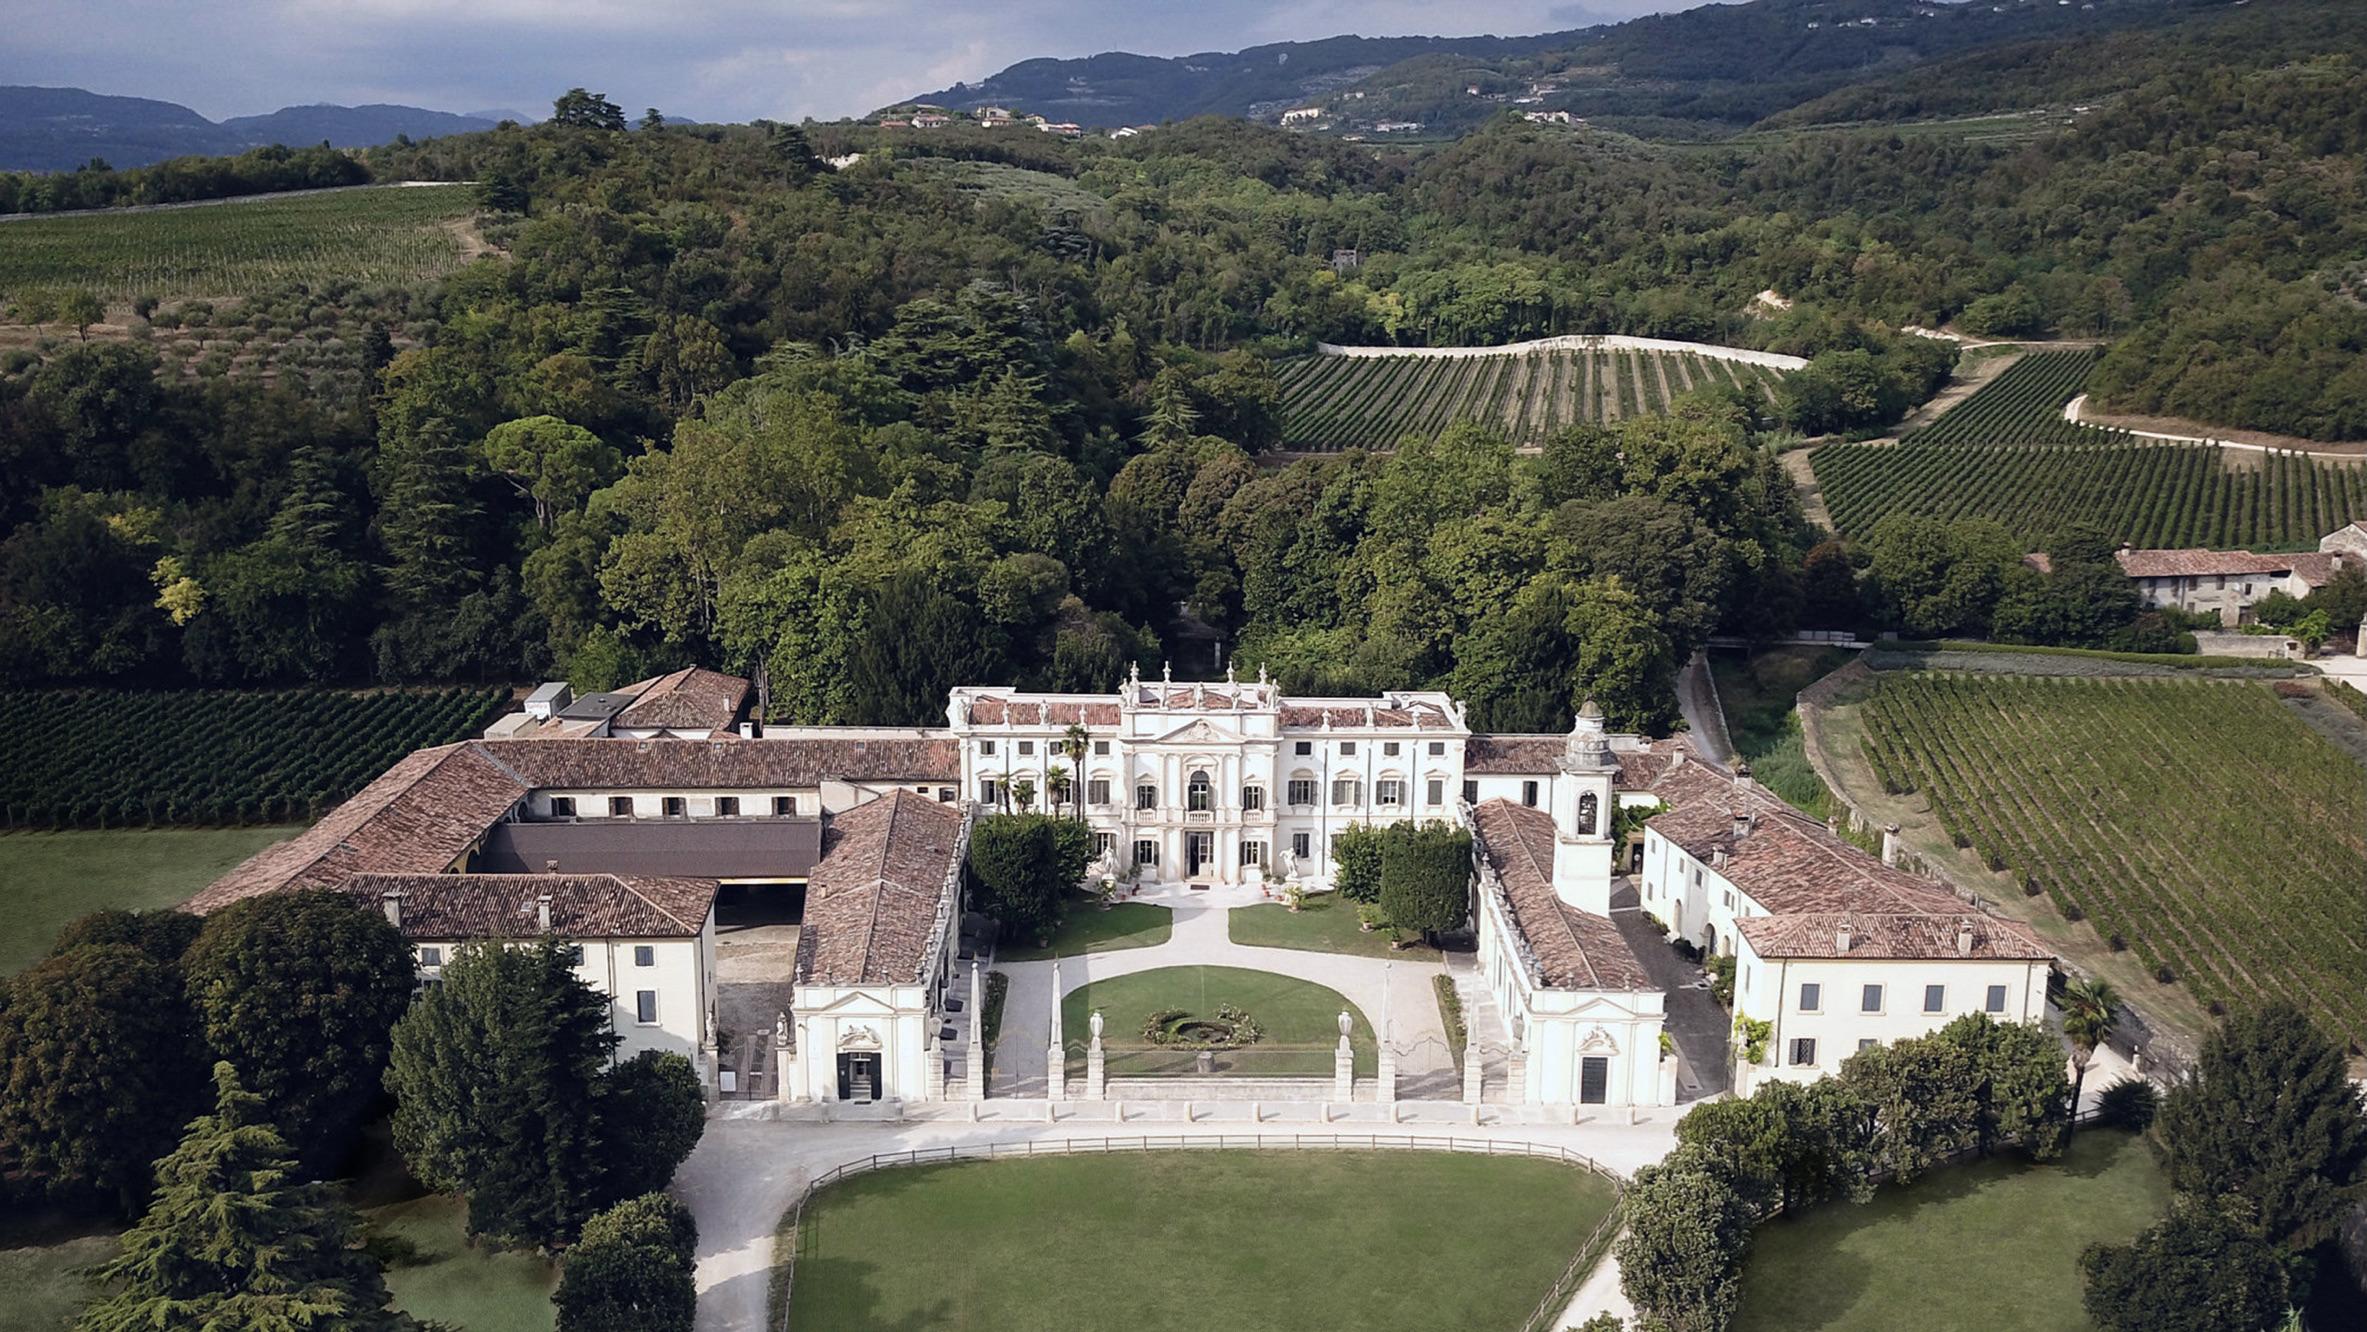 Tenuta Santa Maria di Gaetano Bertani: an expression of the terroir and of a grand passion